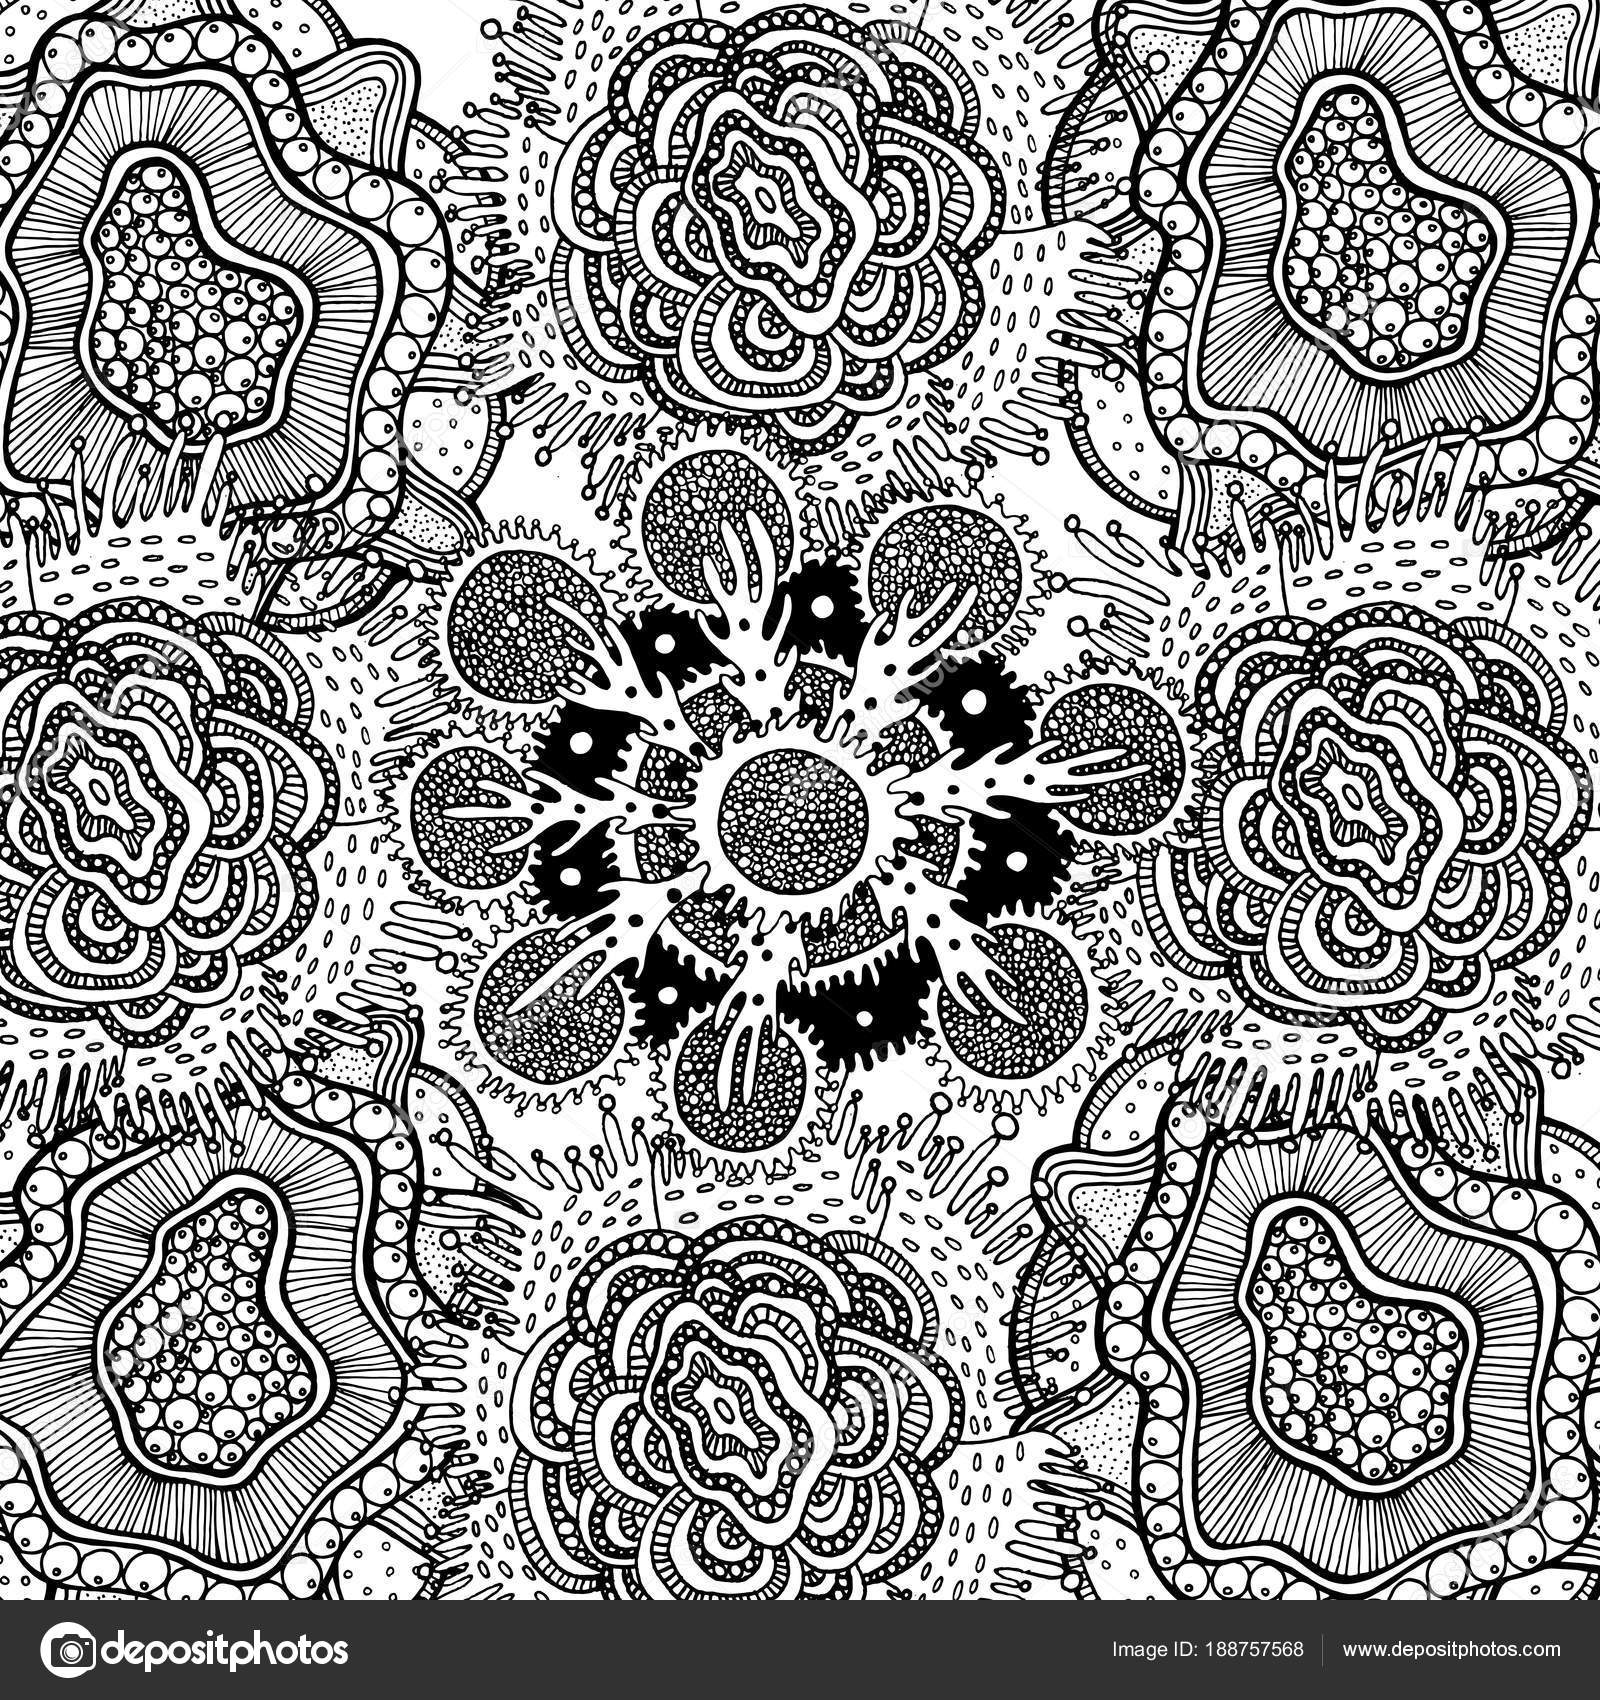 Mandala Sterrenbeelden Kleurplaten.Tribal Kleurplaten Kerst 2018